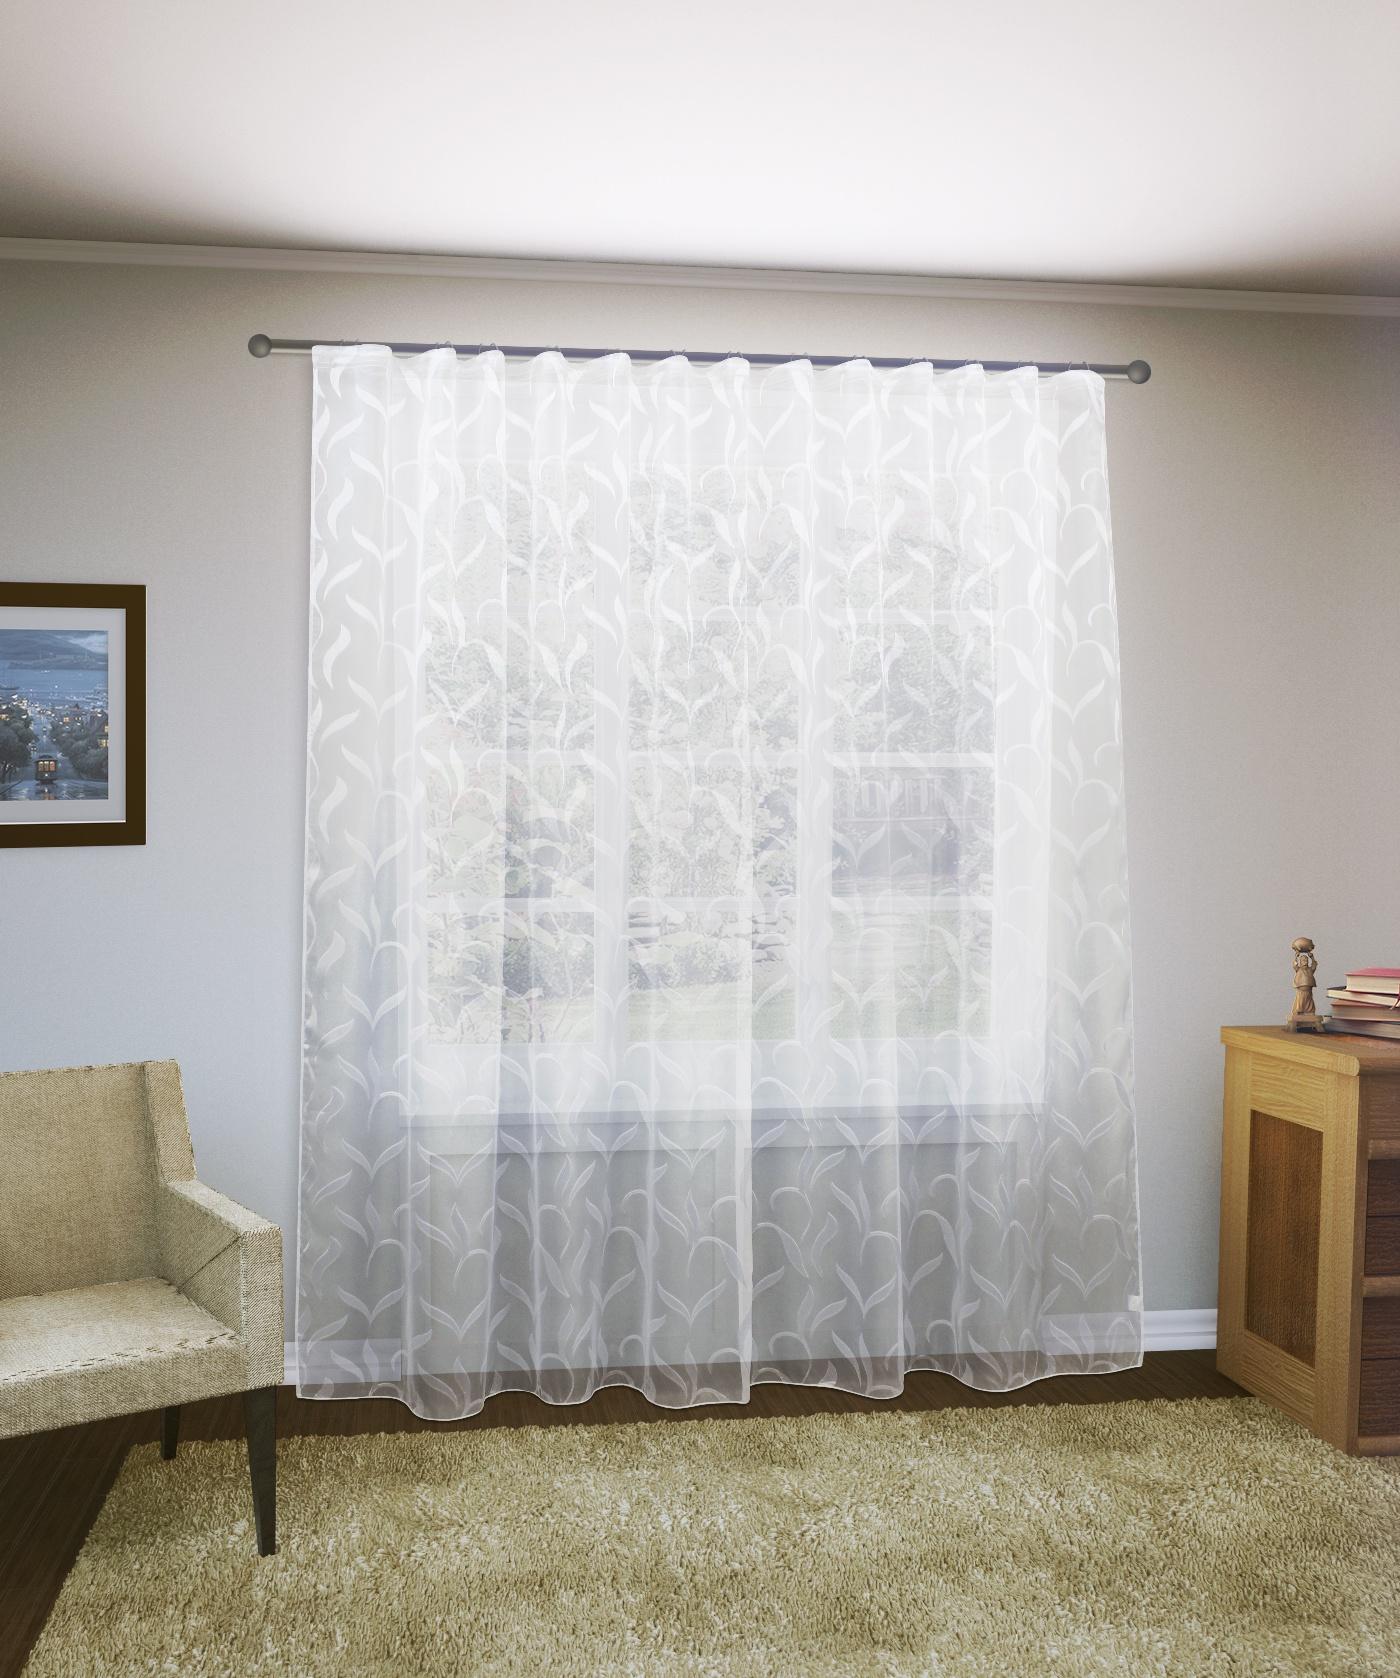 Тюль Sanpa Home Collection Филис, HP9929/9/1E Филис, белый, белый, (300*280) тюль sanpa home collection амая hp18061 120 1e амая белый белый 300 120